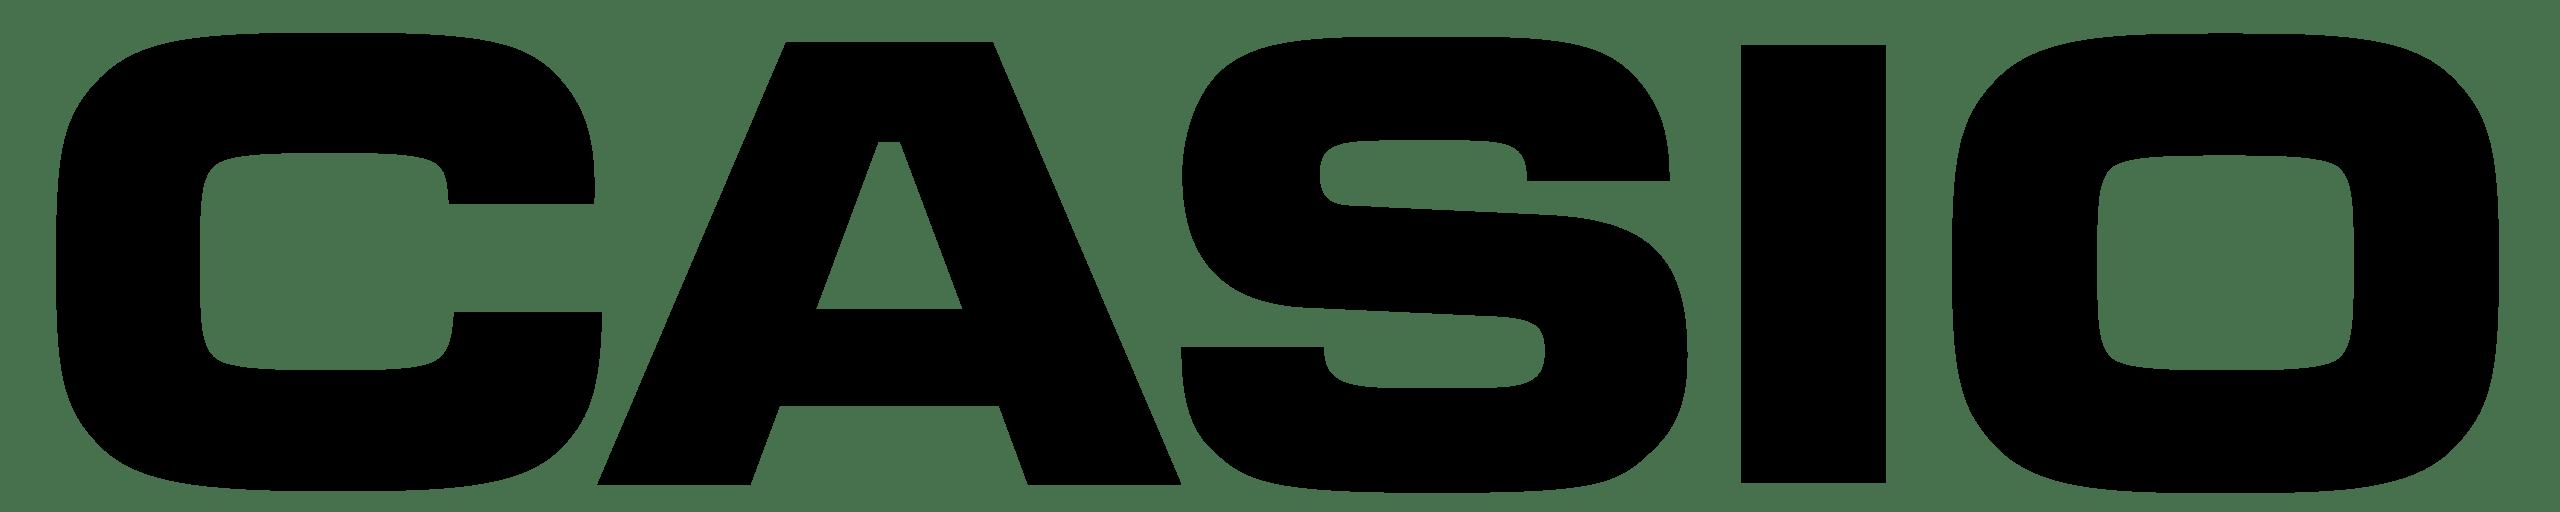 Logo Casio PNG transparents - StickPNG